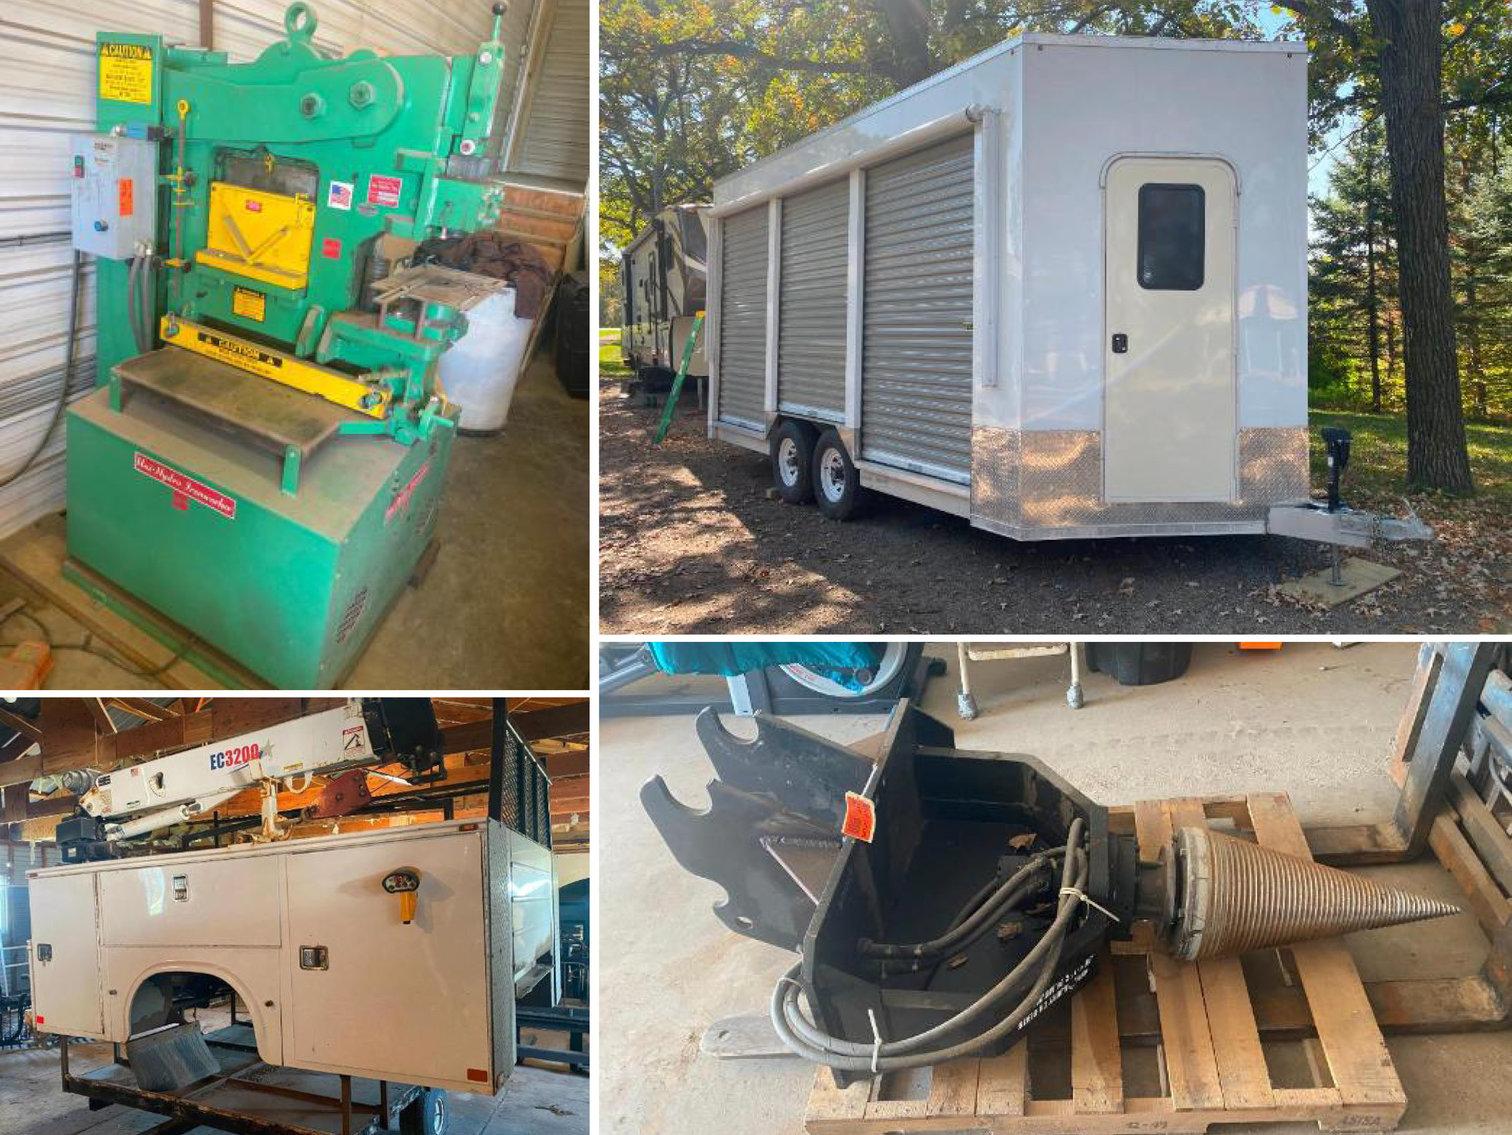 Uni Hydro 66 Ton Ironworker, 2021 Aluma Custom Display Trailer, Knapheide Truck Service Box, Wood Splitter